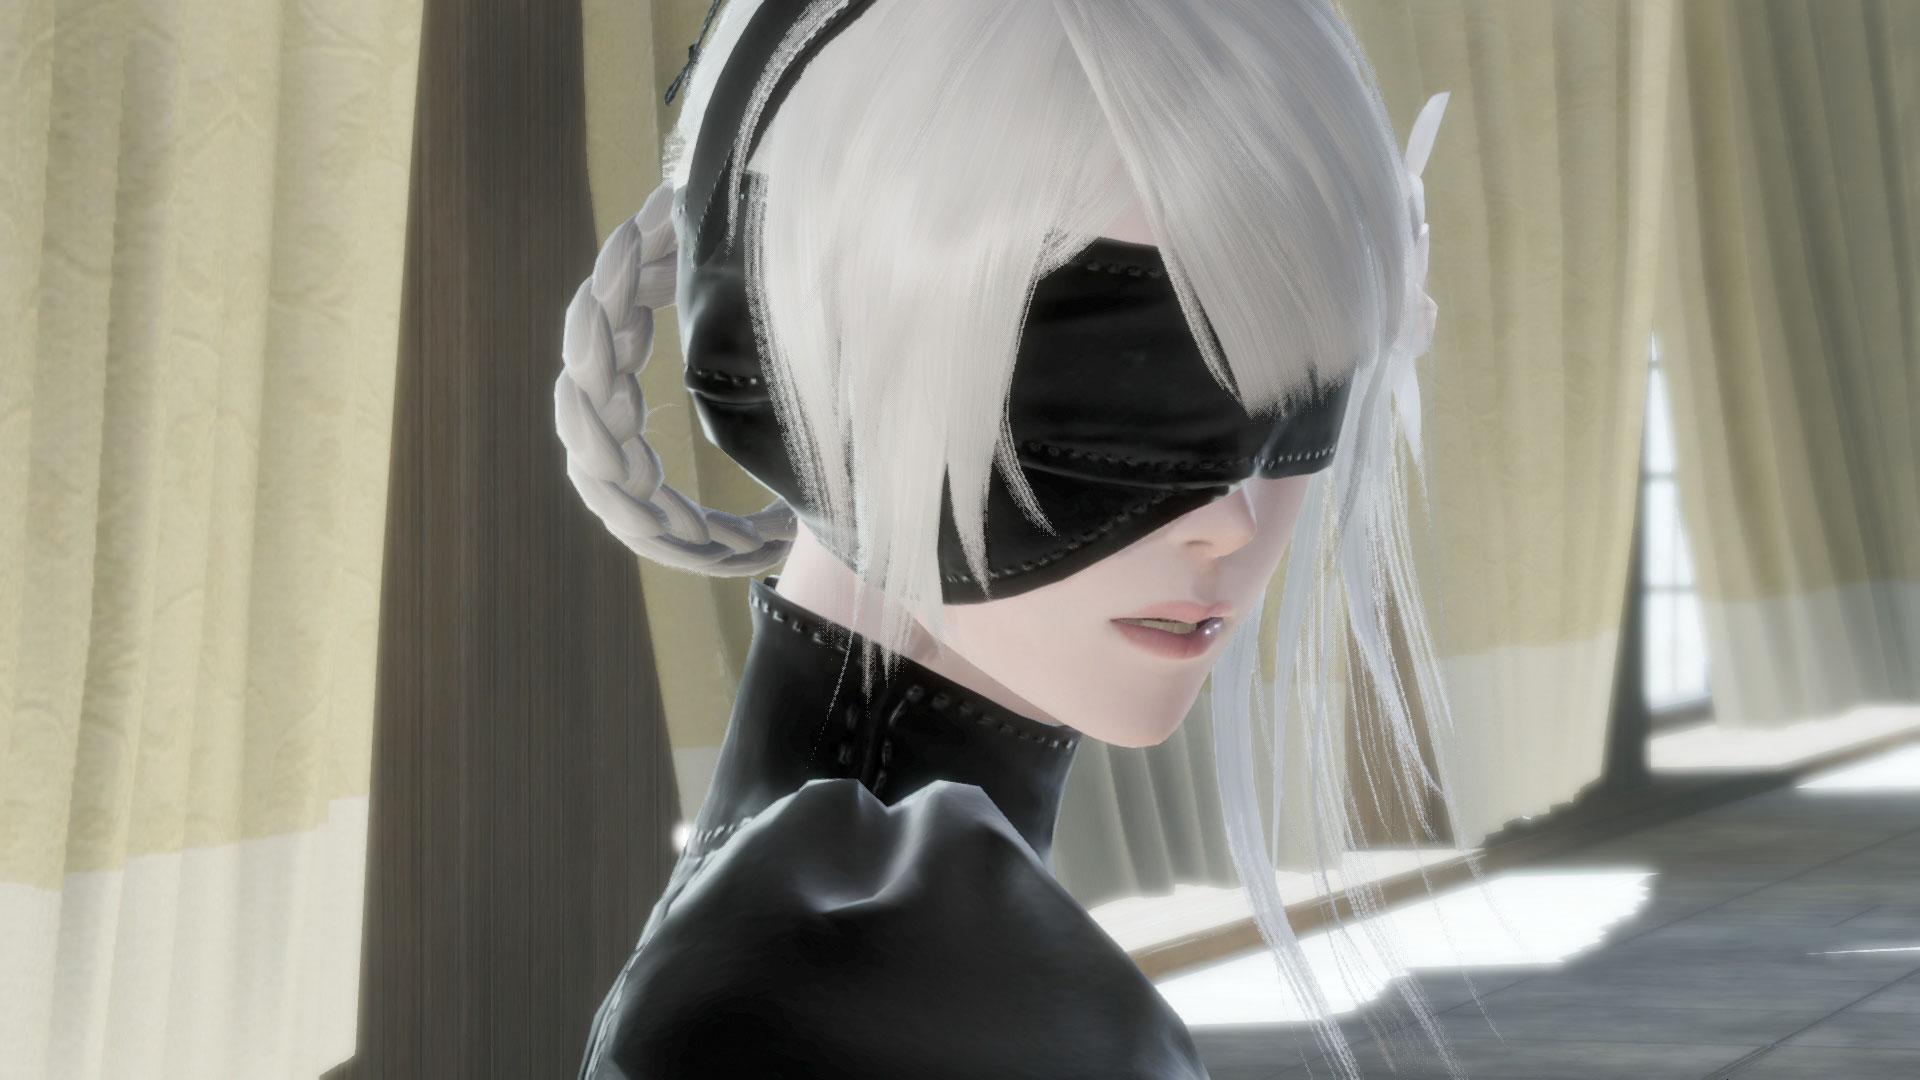 Screenshot Of NieR Automata DLC In NieR Replicant Remake